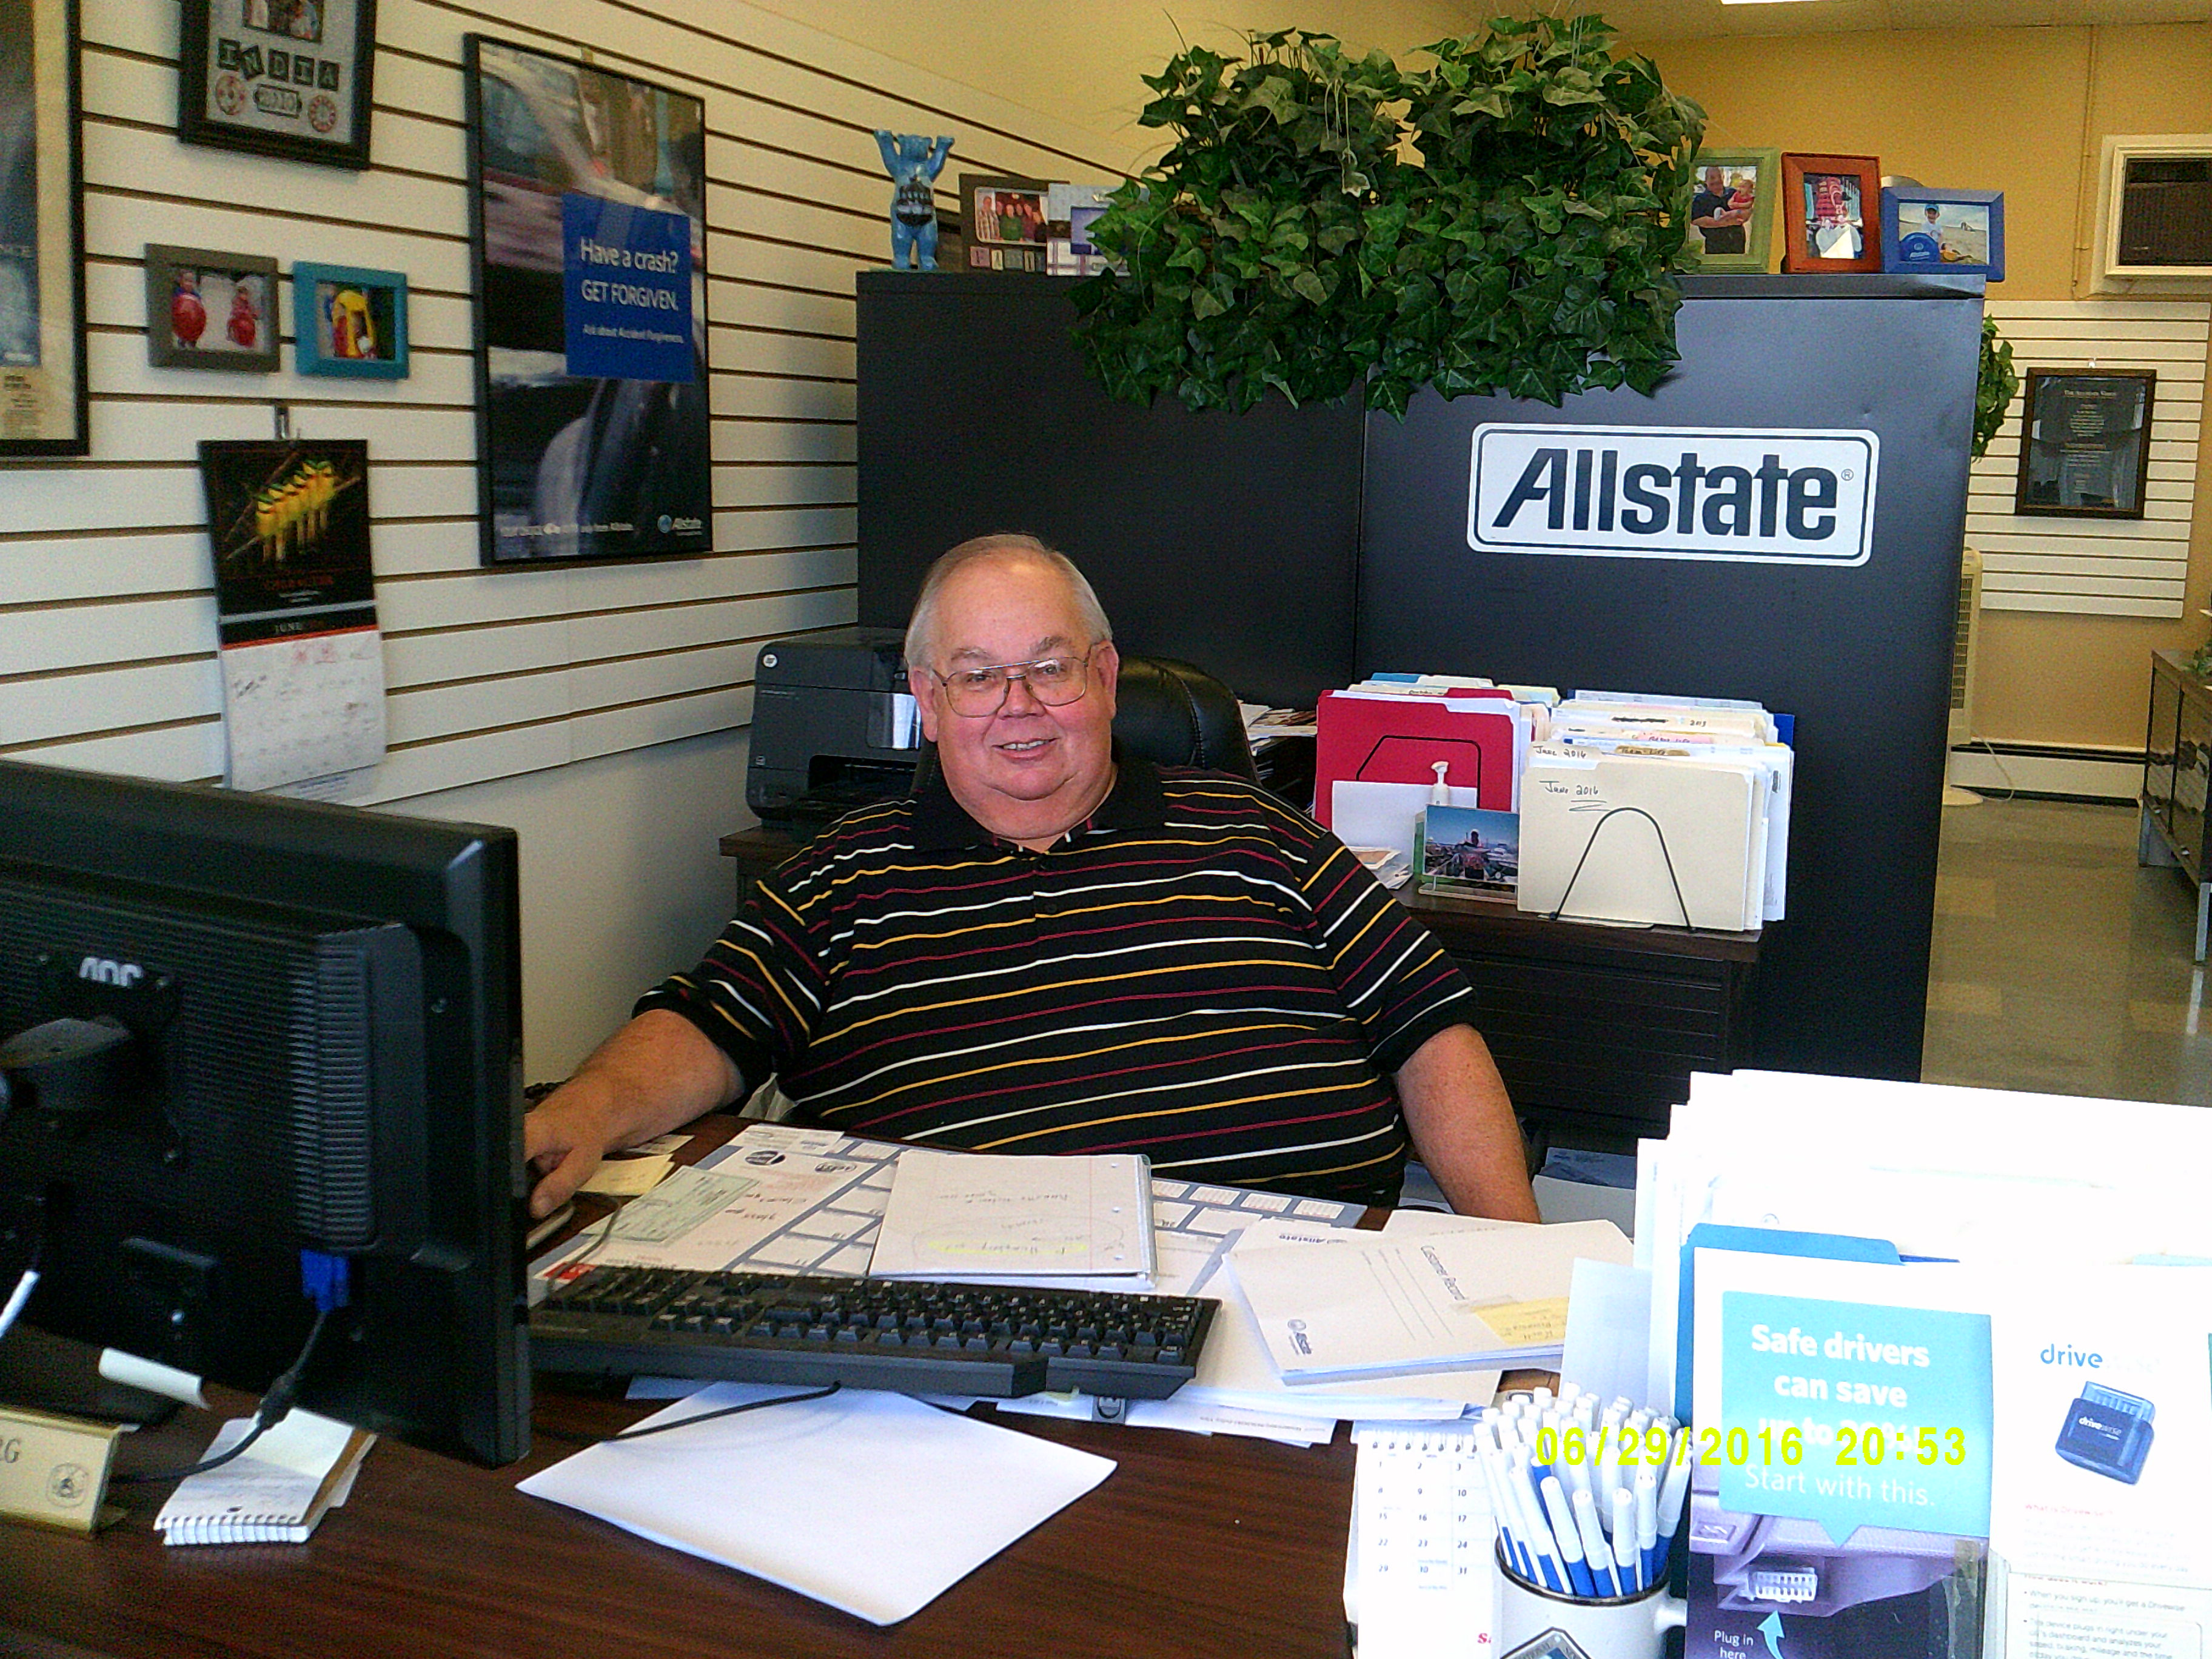 Gary Stoneberg: Allstate Insurance image 1